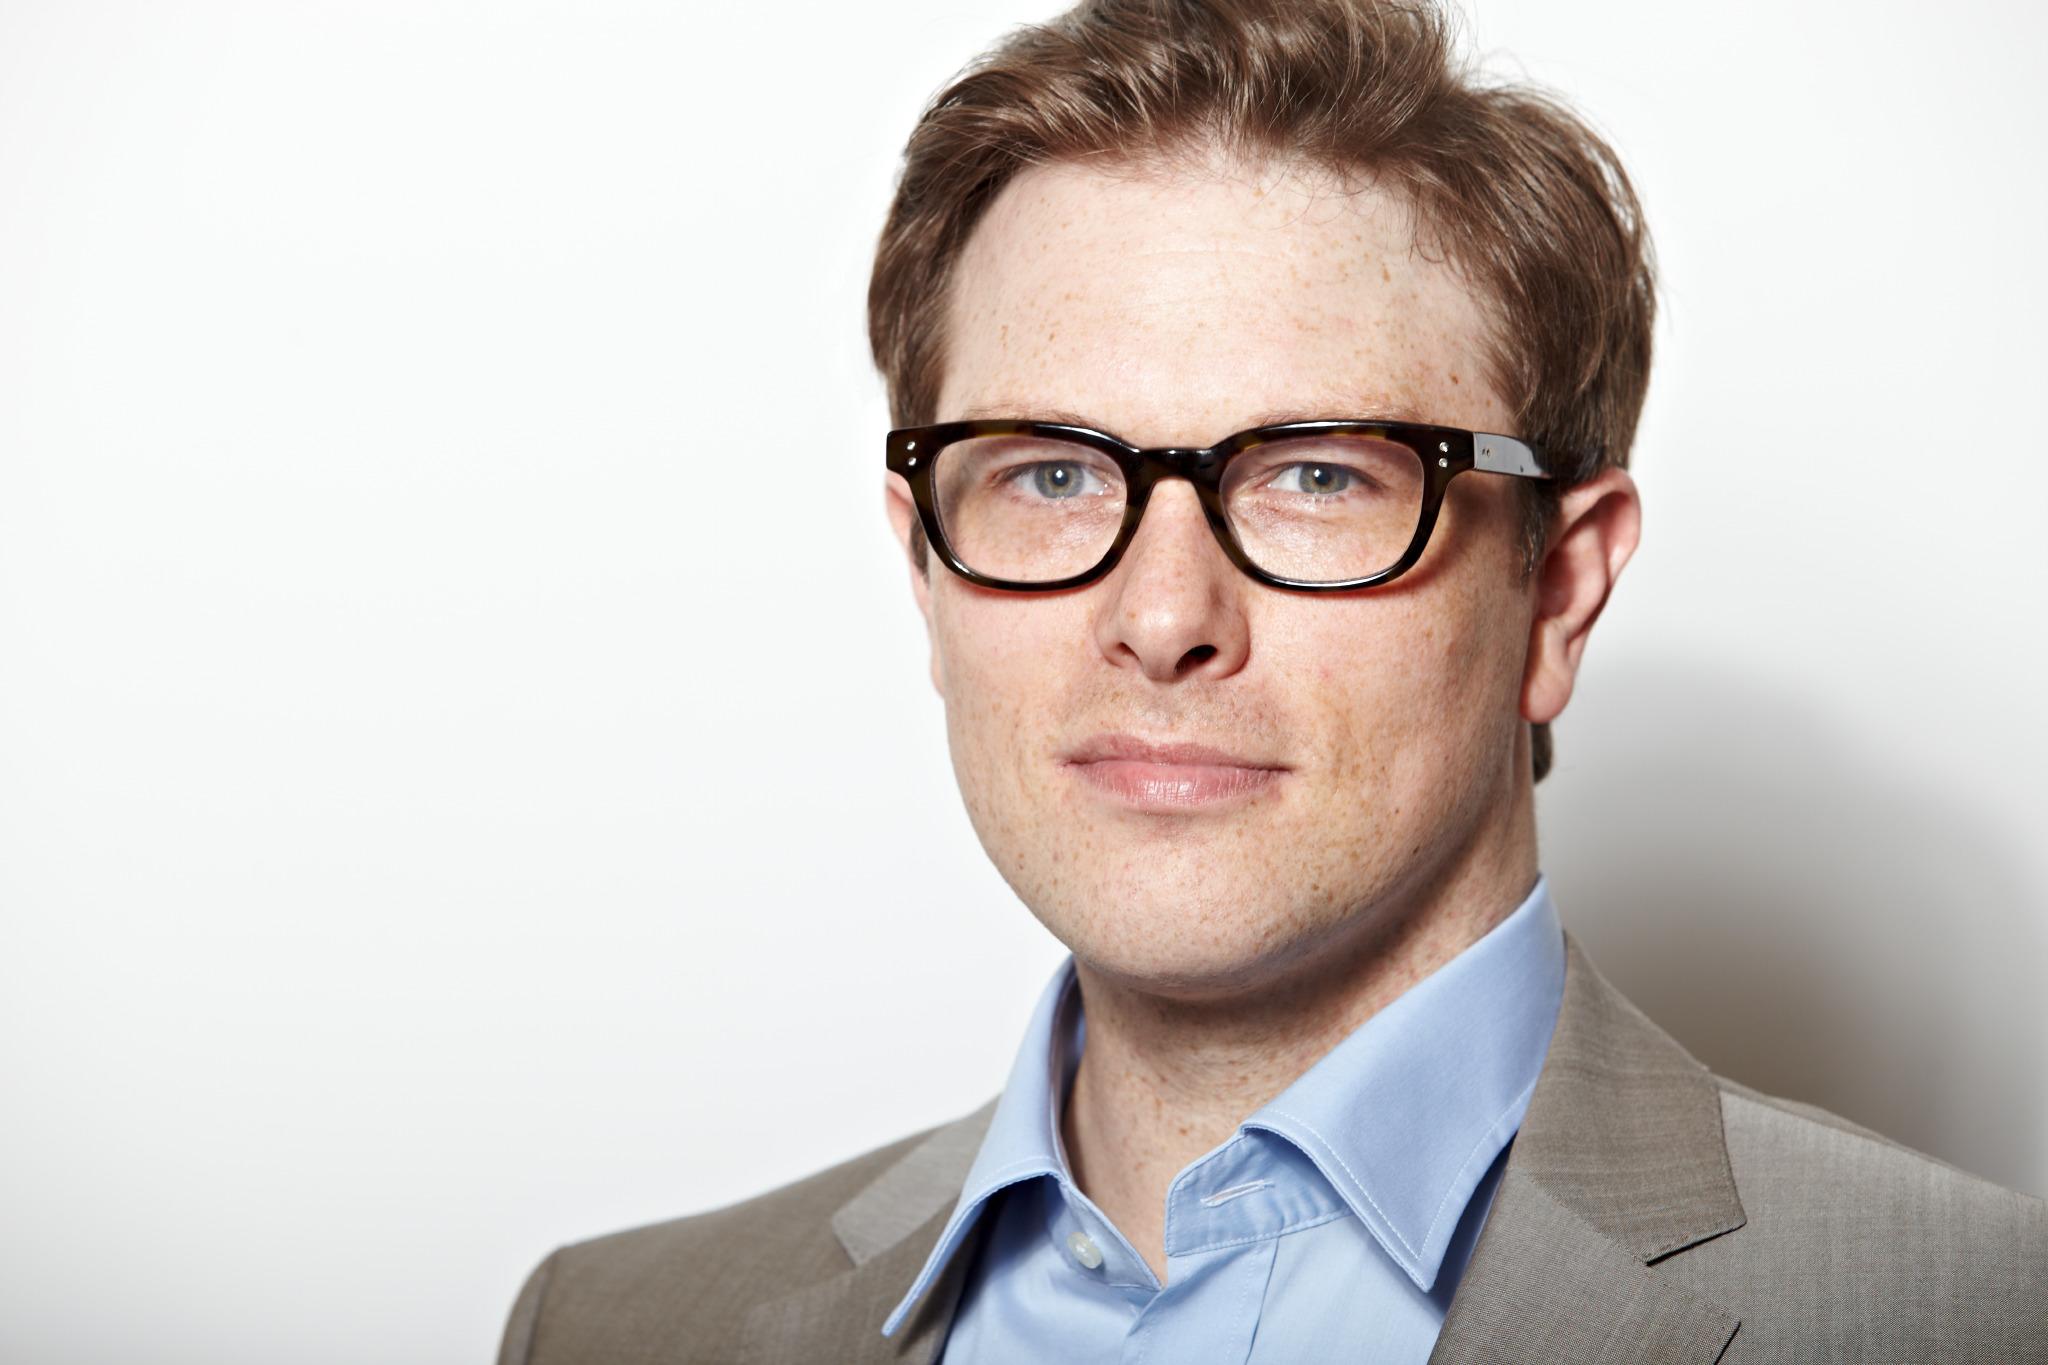 Simon Holz